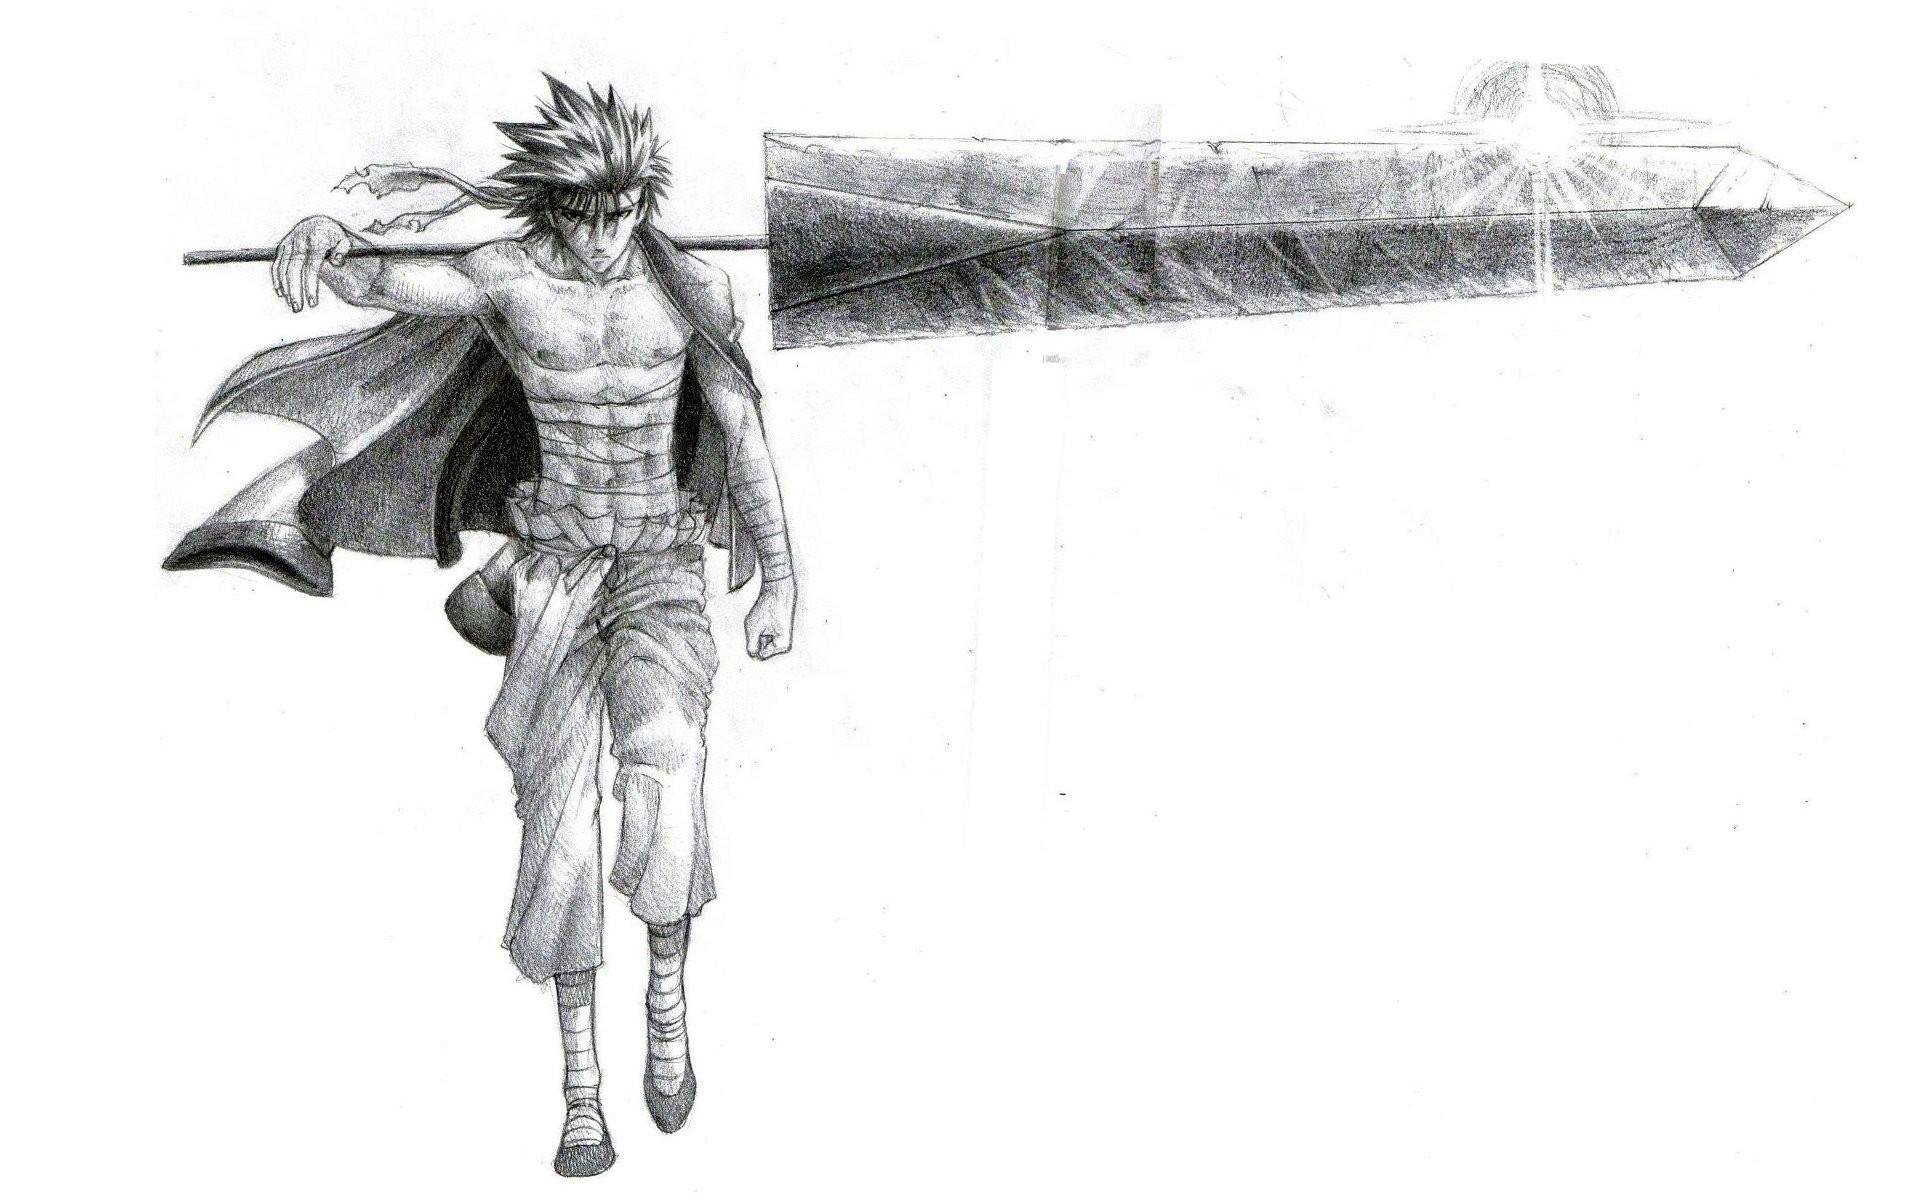 Rurouni Kenshin drawings simple background Sanoskue wallpaper | |  333300 | WallpaperUP